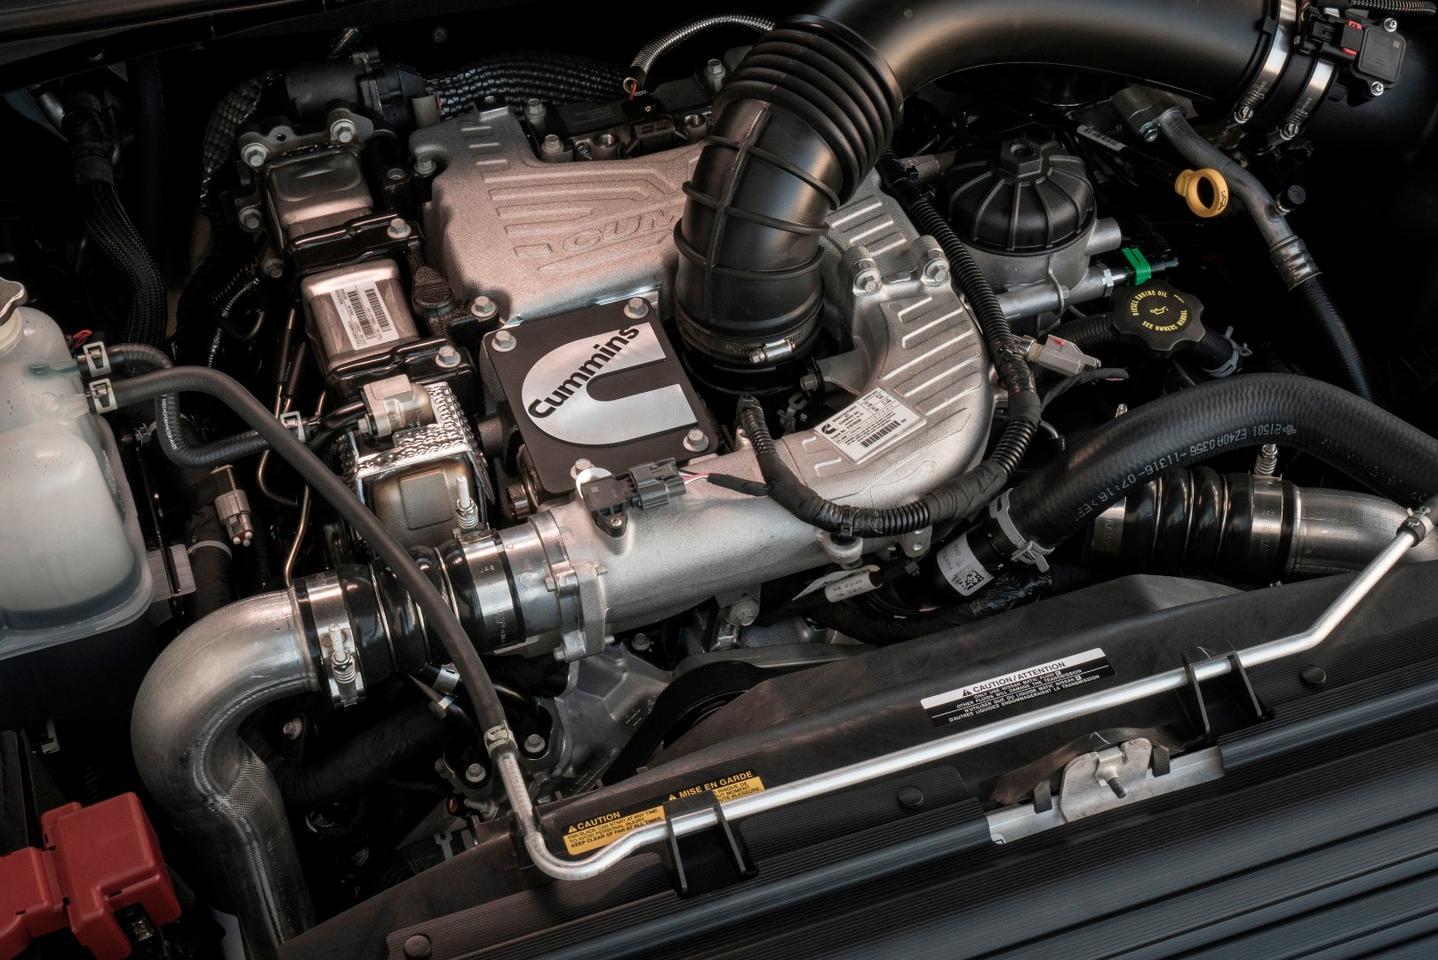 The Cummins diesel has 555 lb.ft of torque